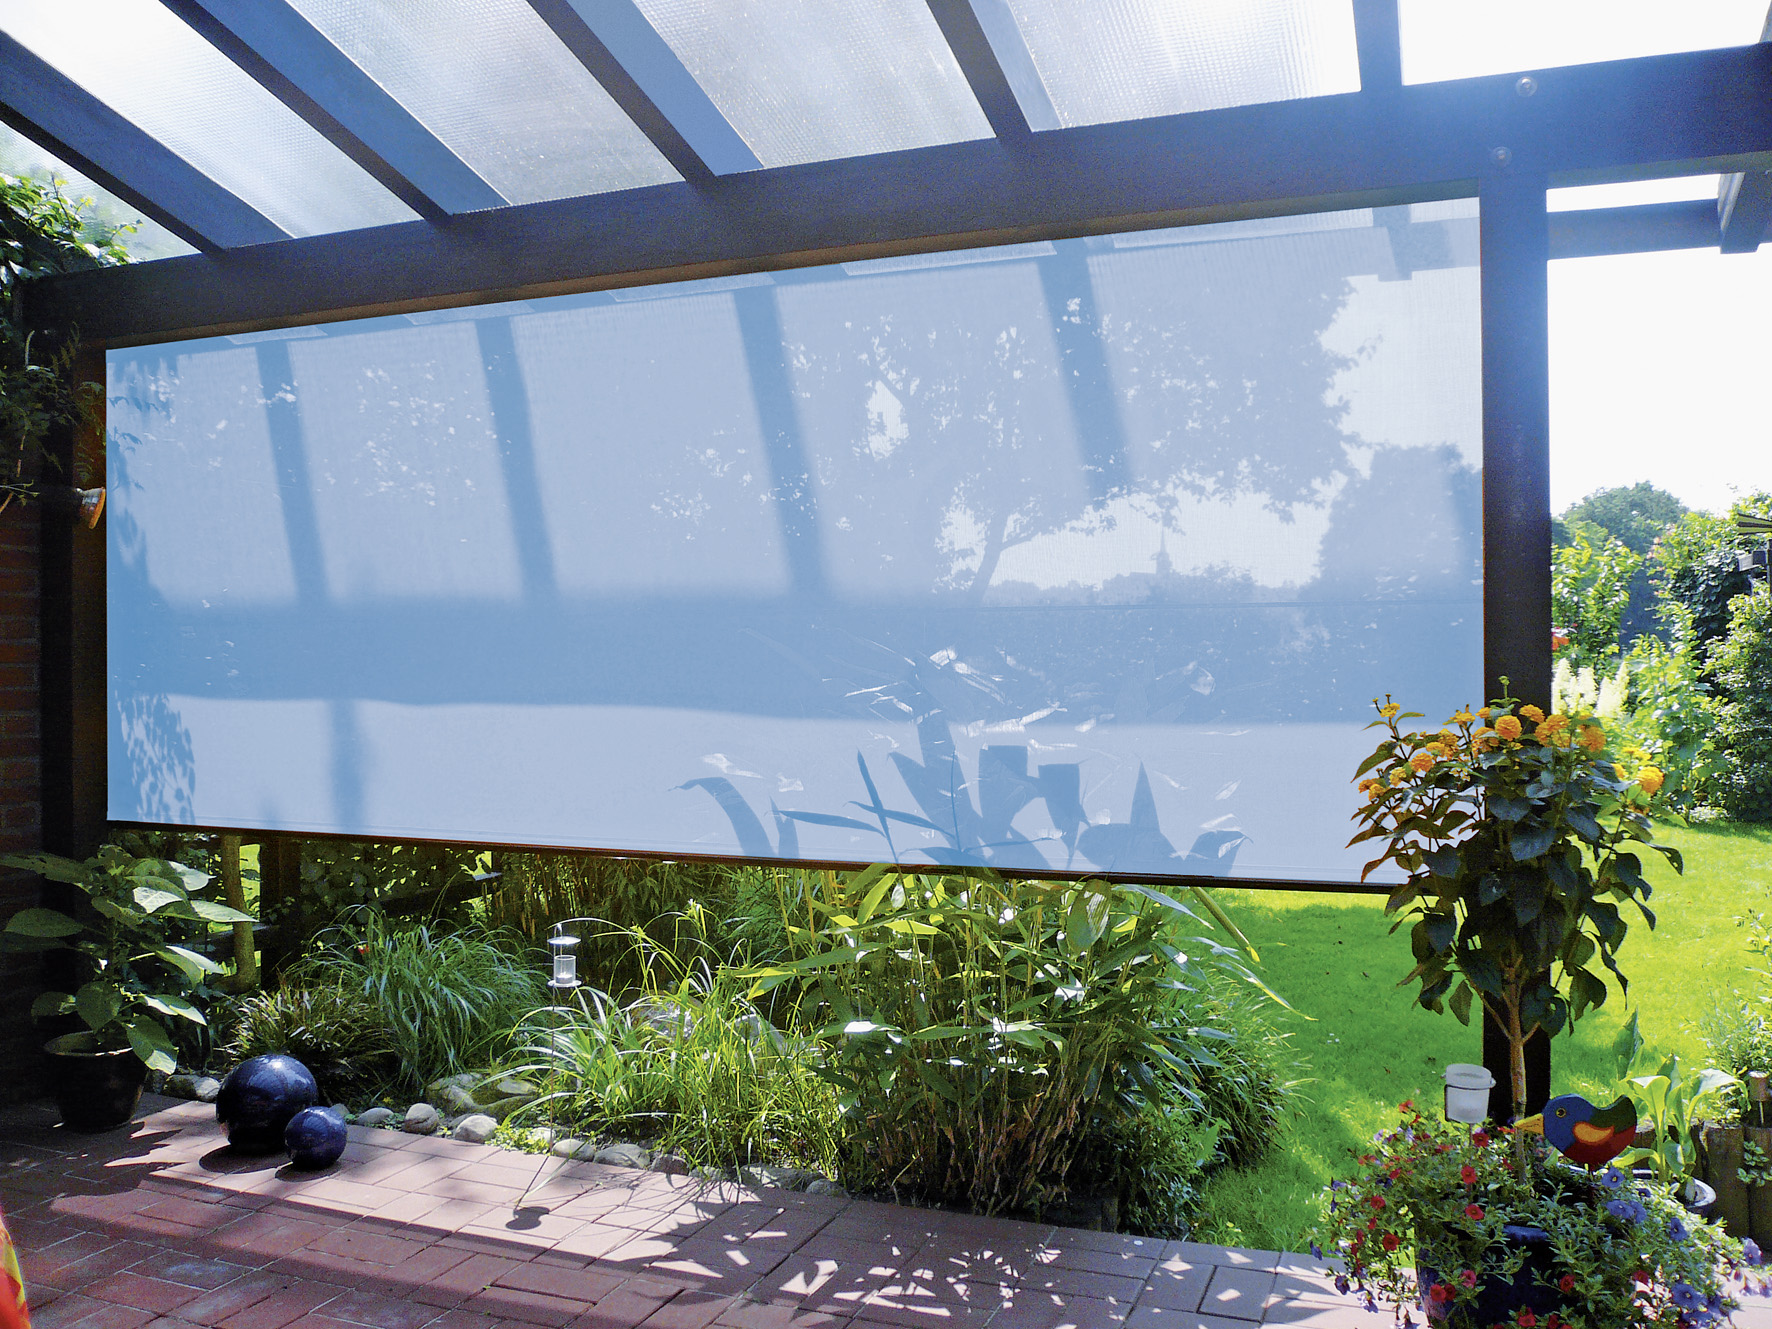 Vertikaler Sonnenschutz Balkonsichtschutz Sonnensegel